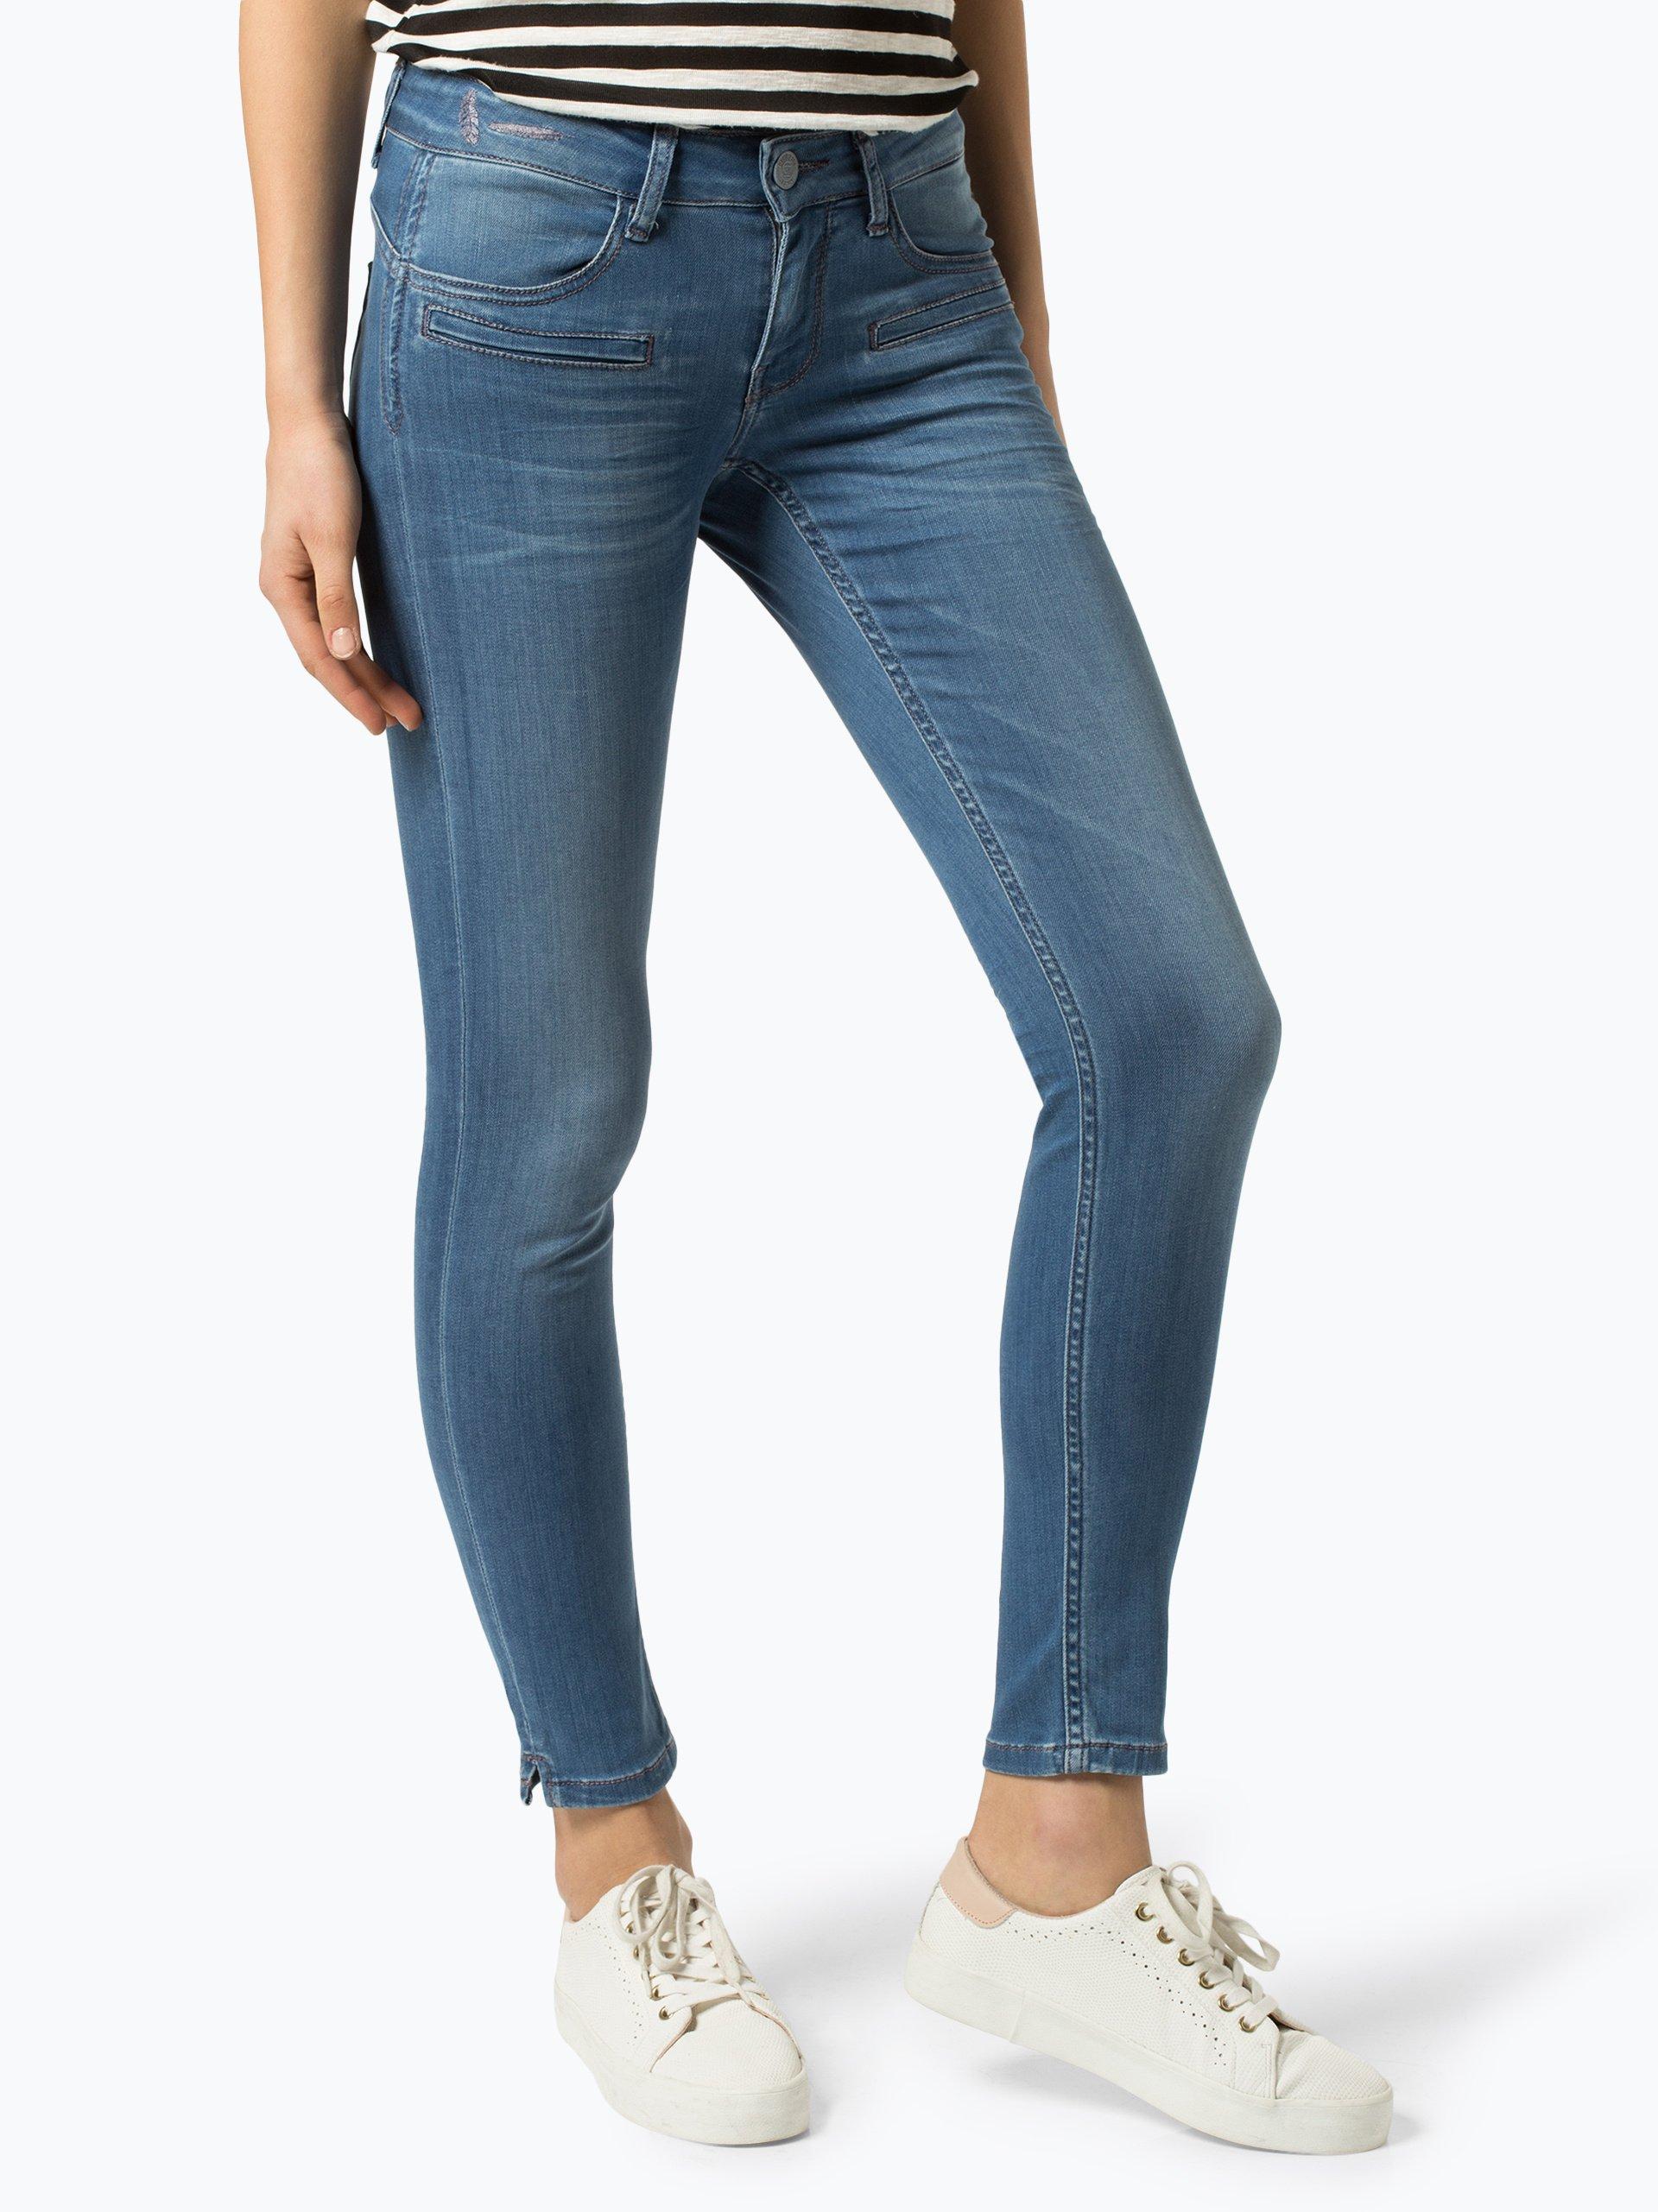 Blue Fire Damen Jeans - Alicia